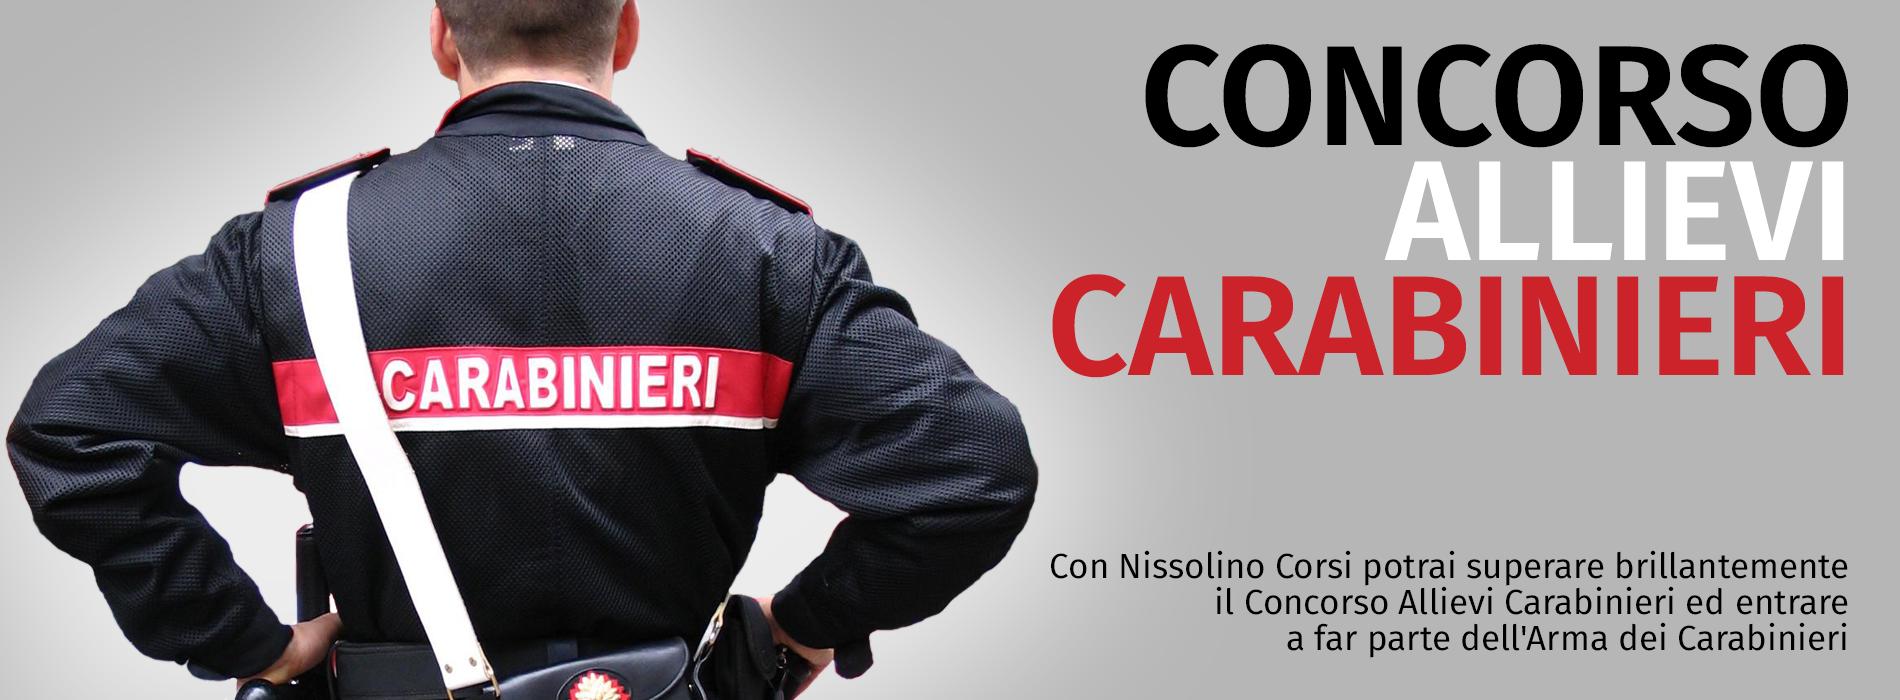 Concorso 2.000 Allievi Carabinieri 2018